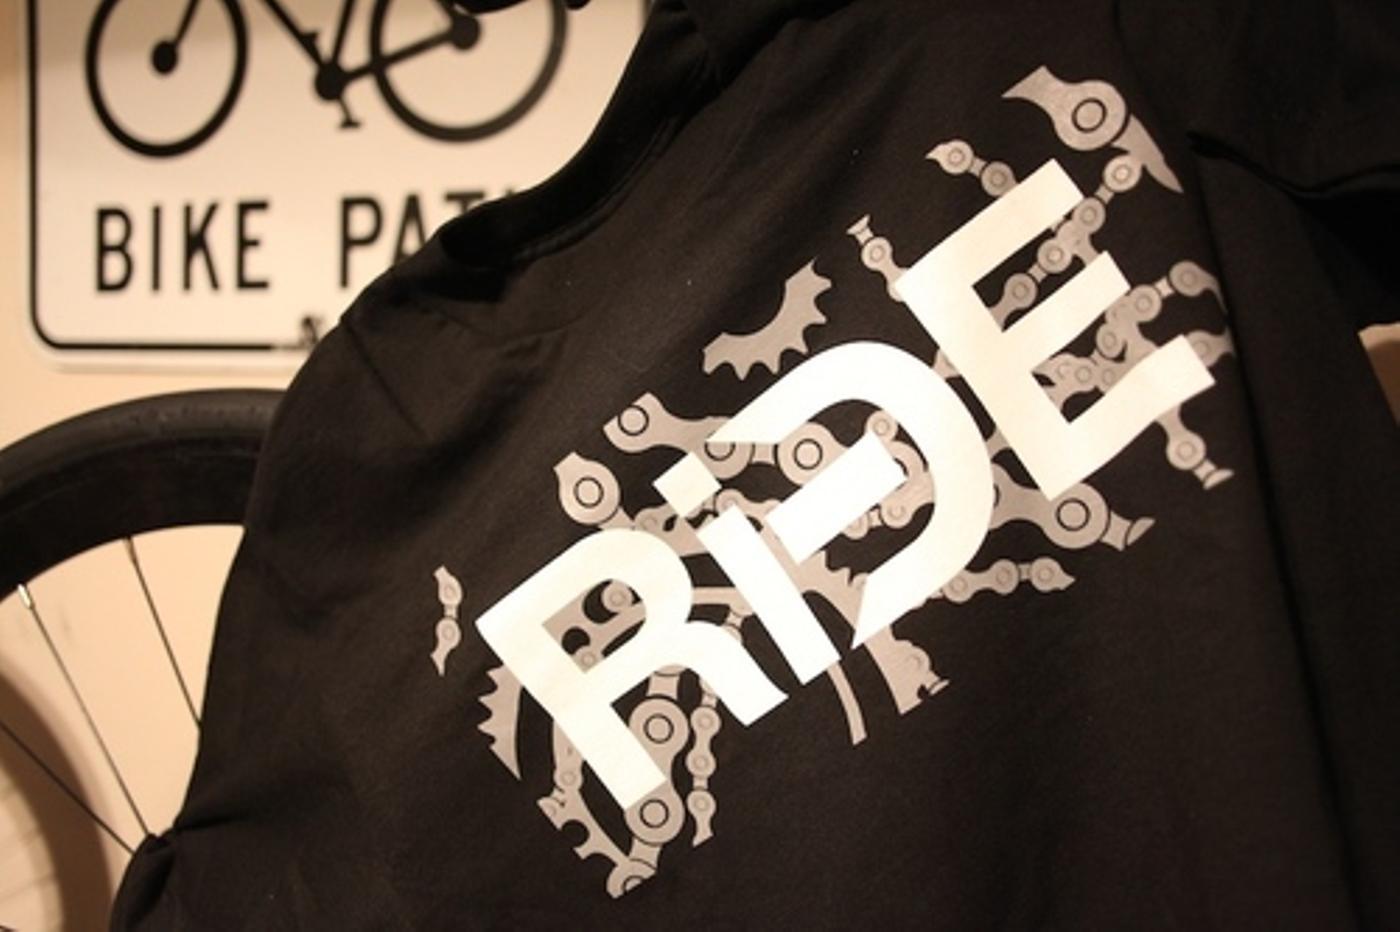 Ride-v2-PINP.jpg